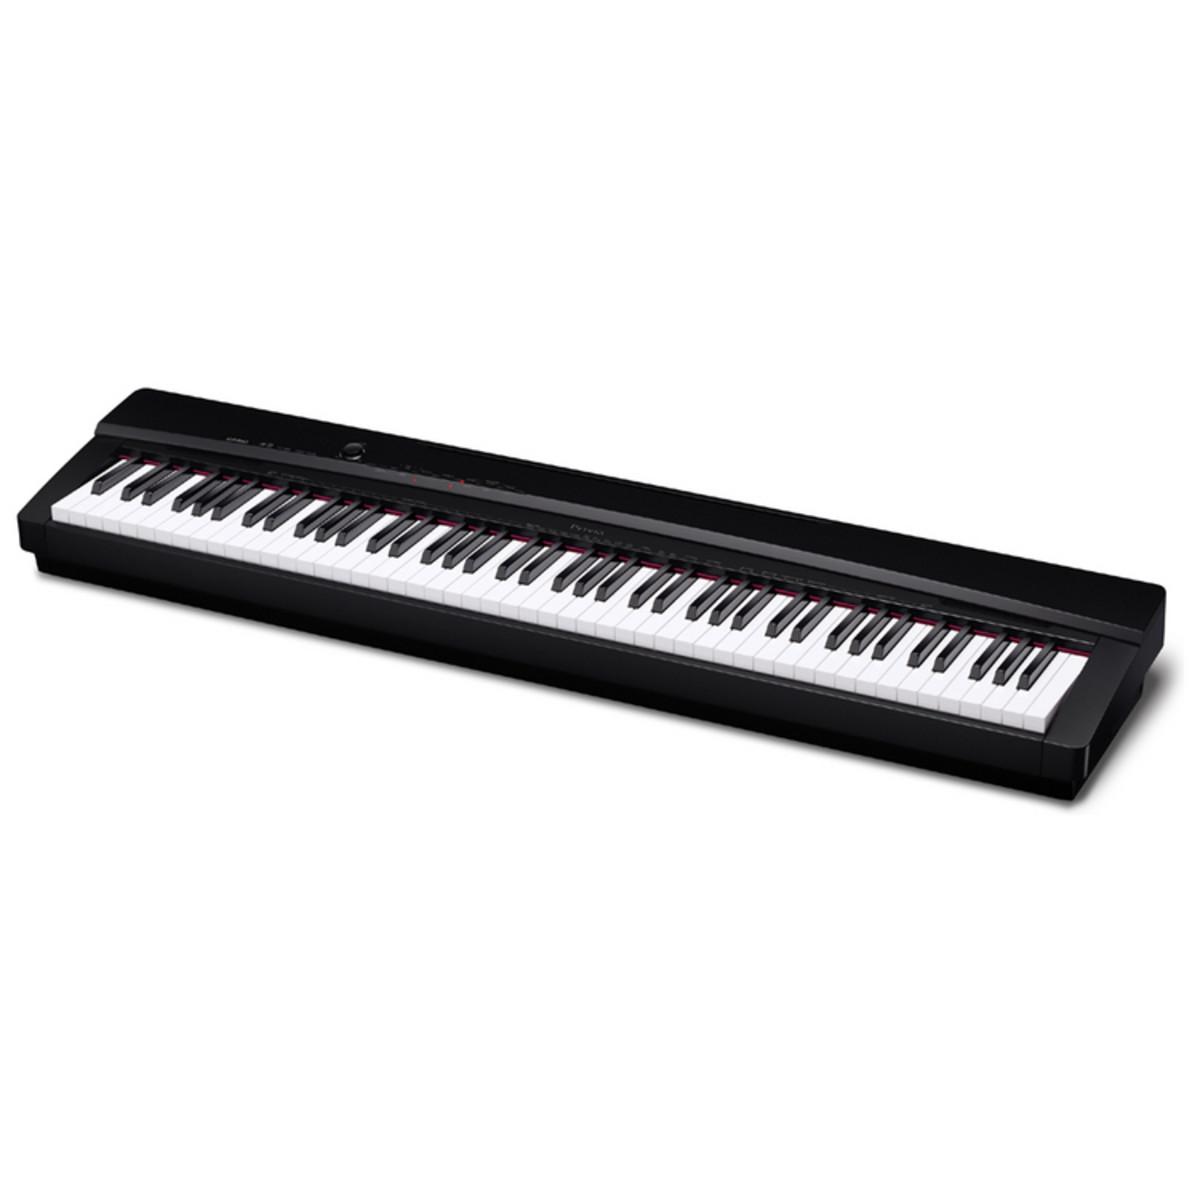 casio px 135 digital piano black at. Black Bedroom Furniture Sets. Home Design Ideas